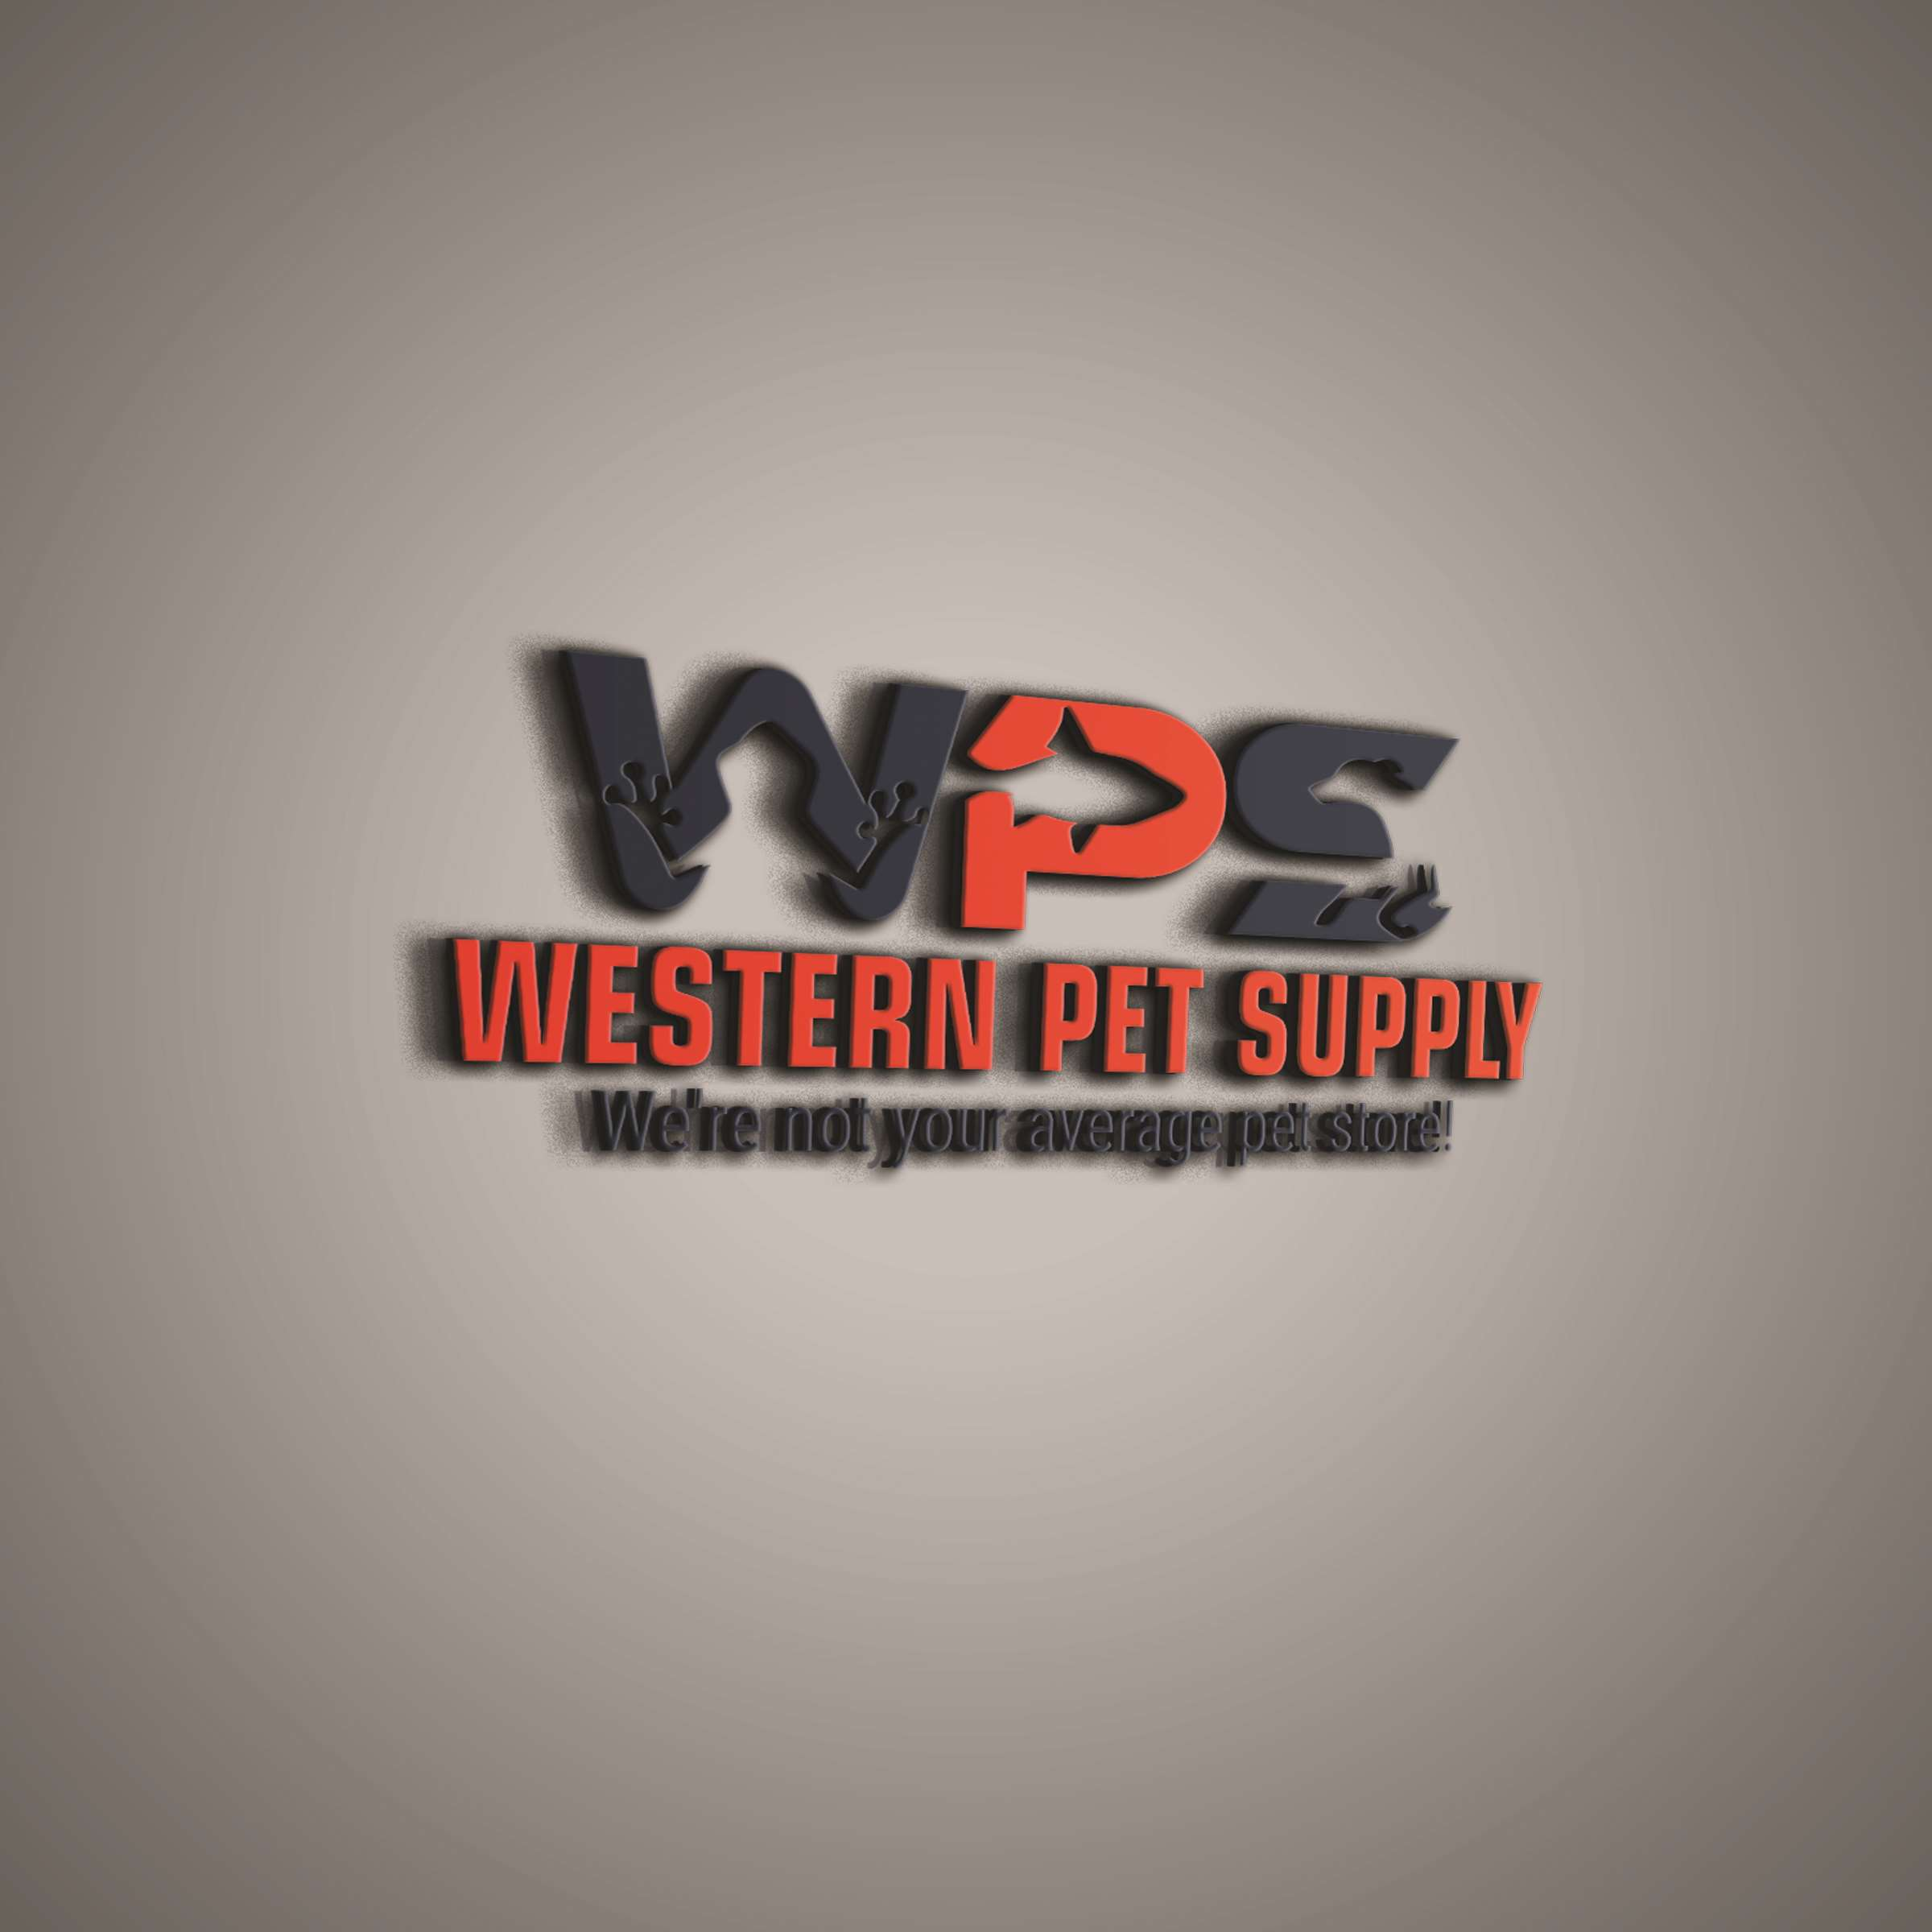 Western Pet Supply